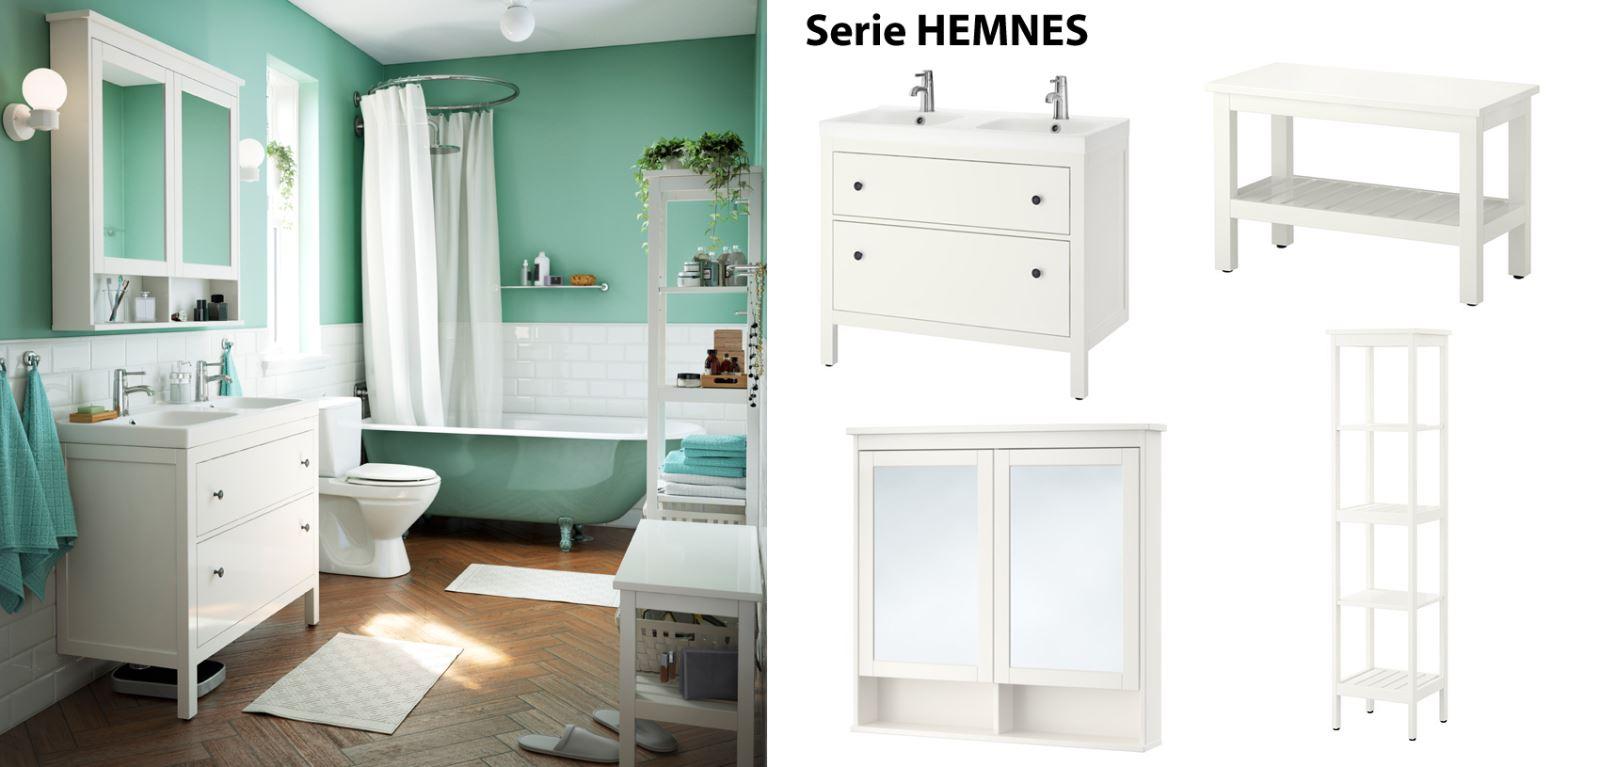 Hemnes bagno mobili bagno ikea hemnes mattsole come - Ikea hemnes bagno ...